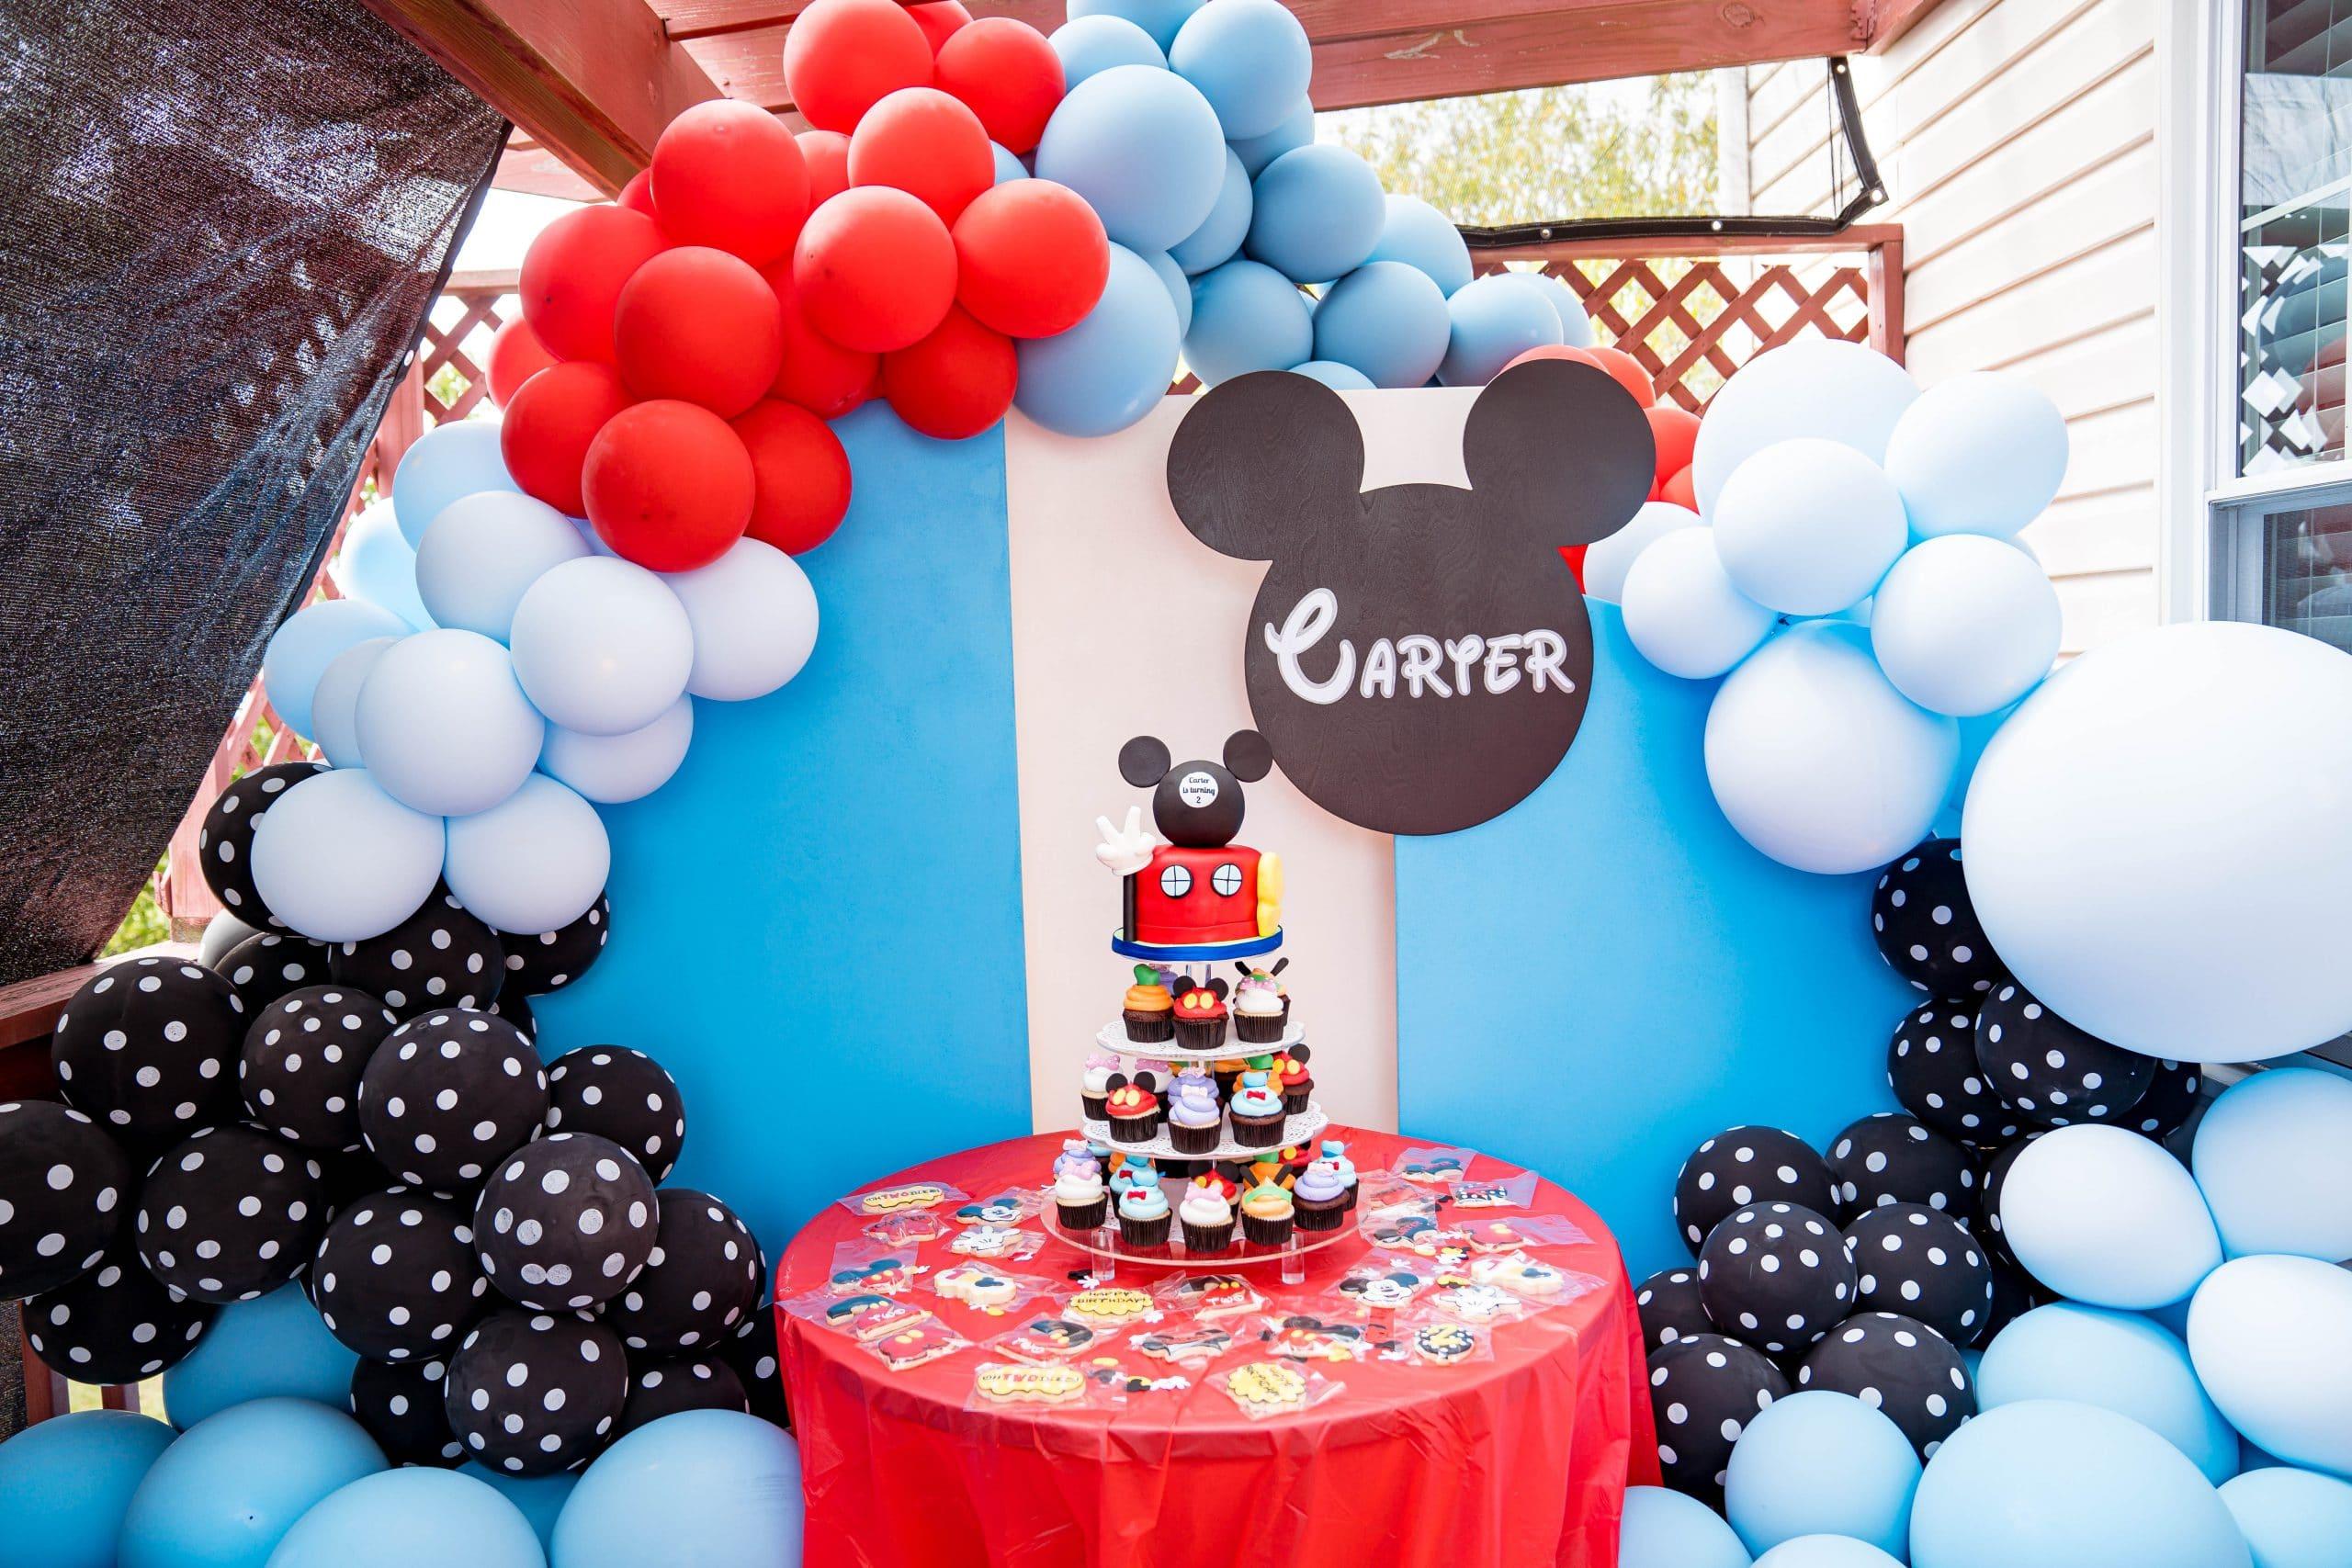 livinglesh slaydisplays mickey mouse clubhouse birthday party display